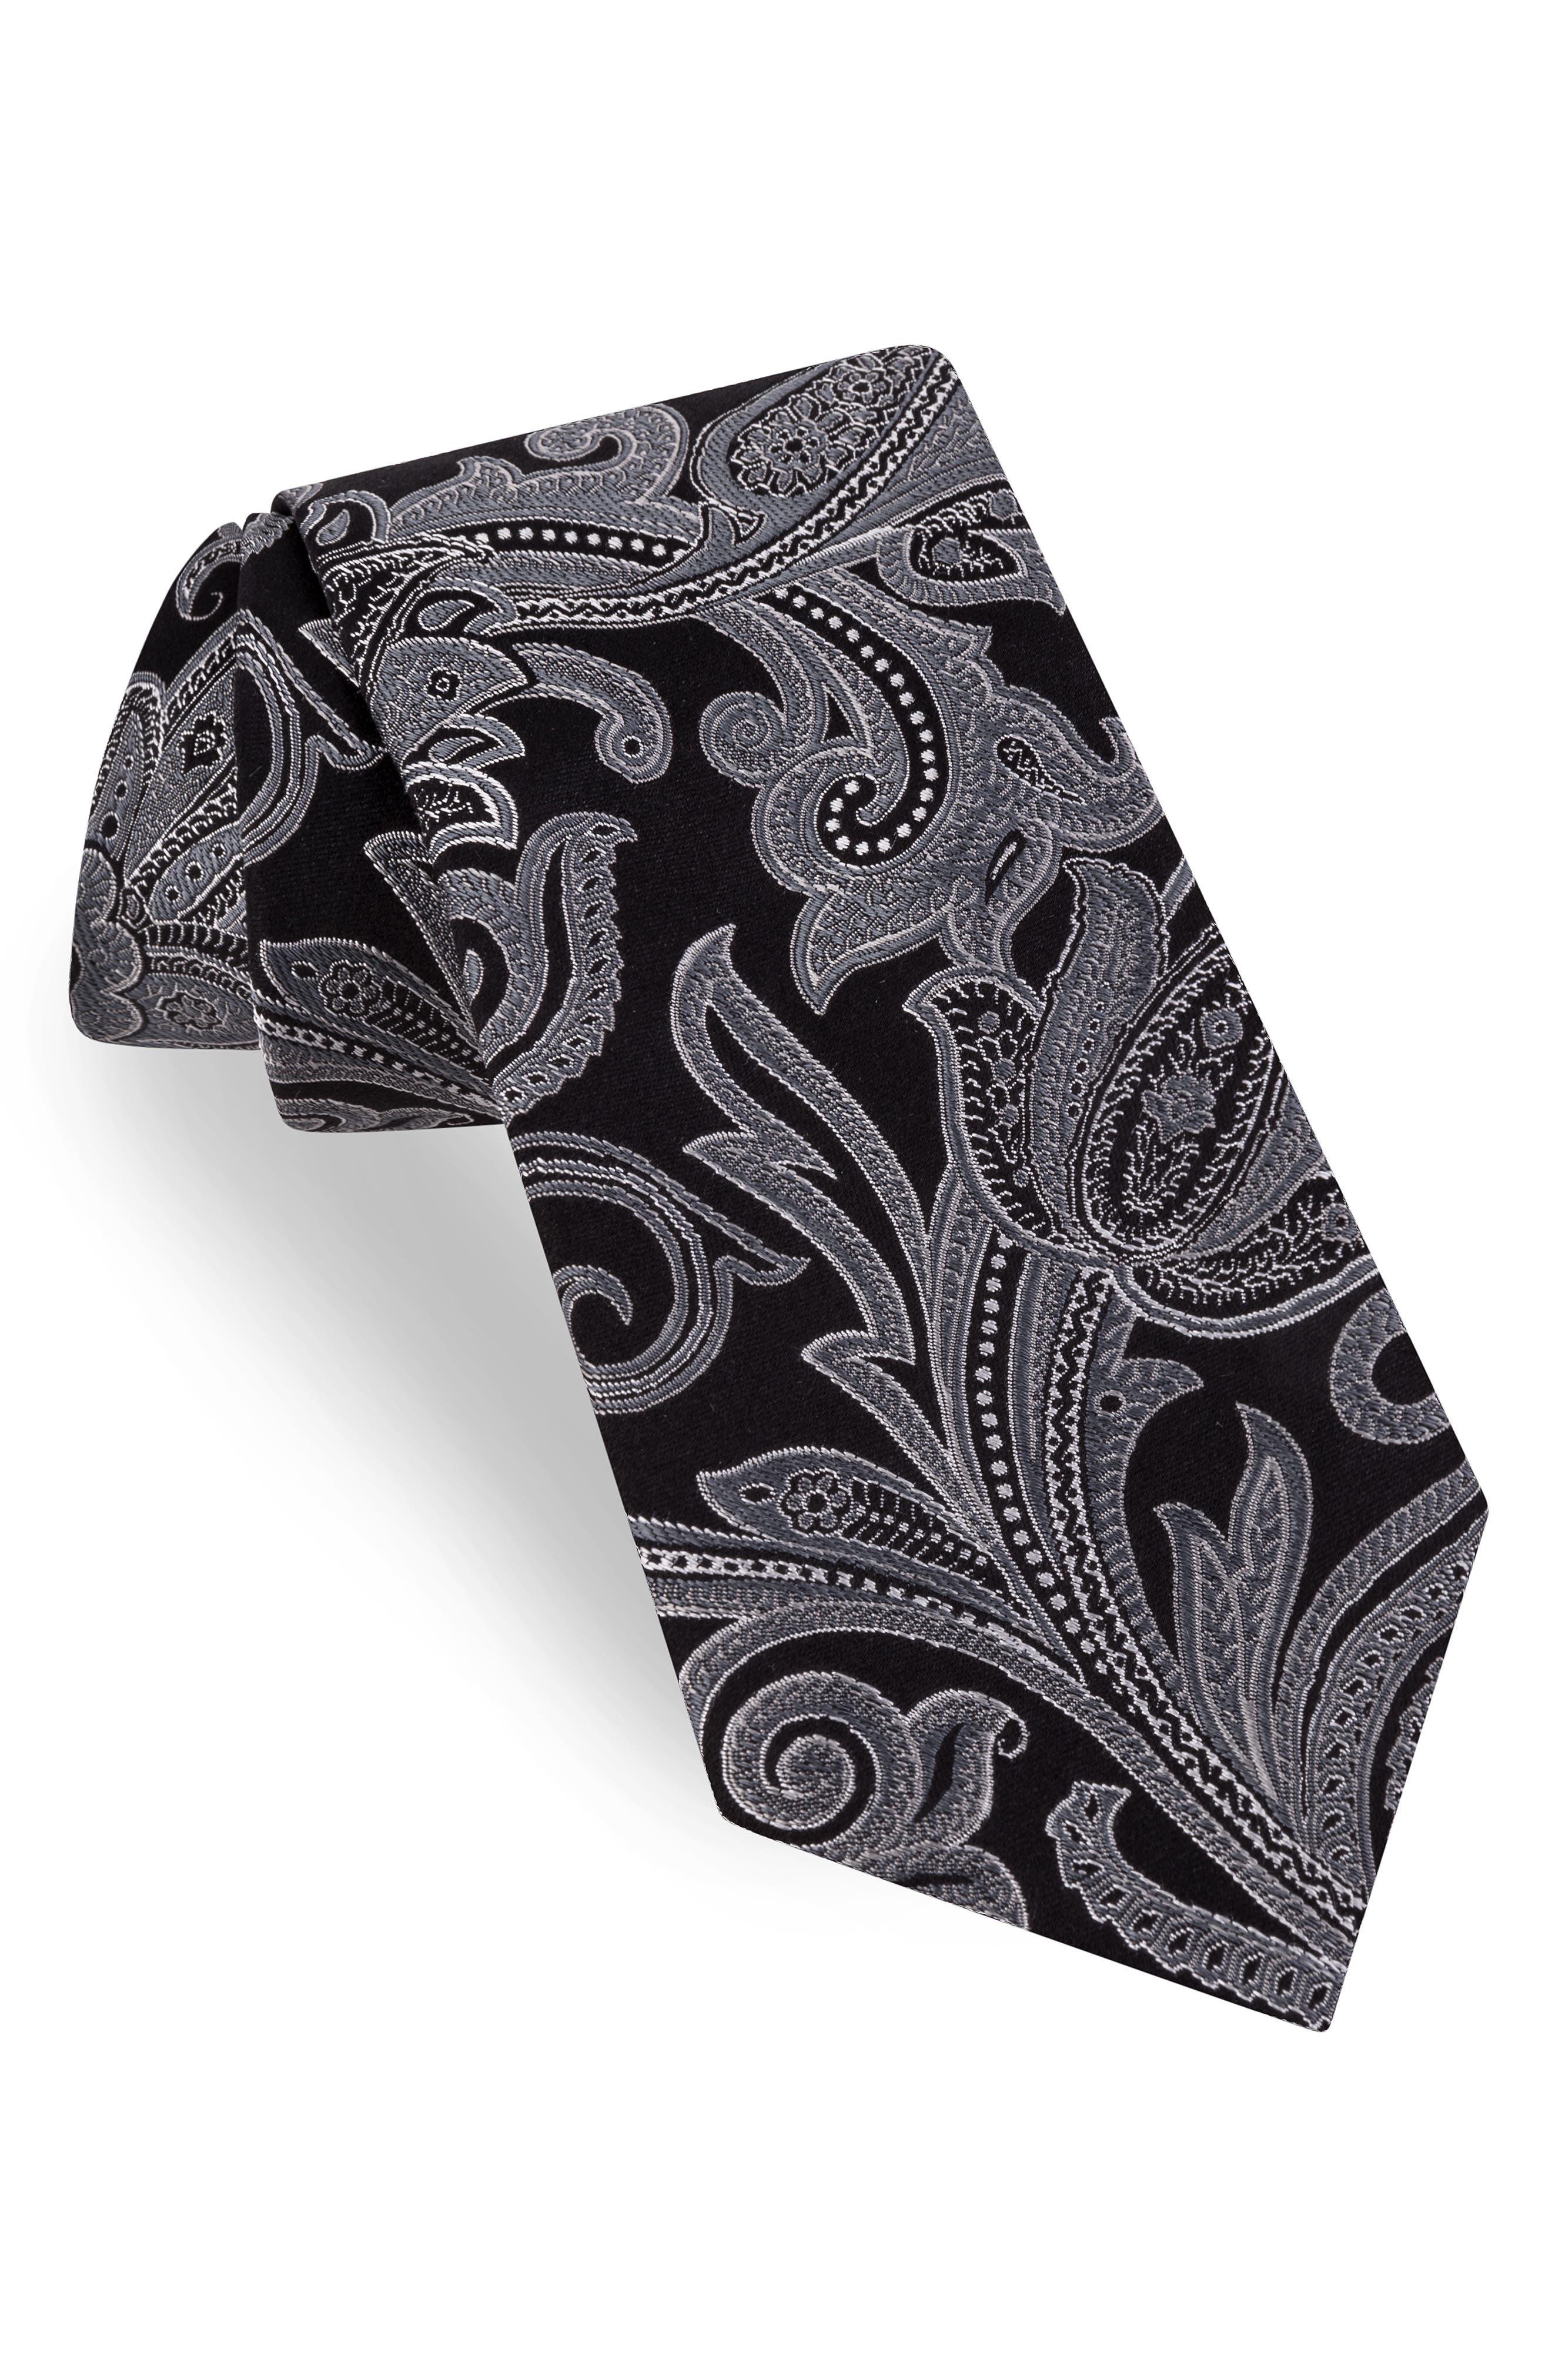 TED BAKER LONDON Contrast Paisley Silk Tie, Main, color, BLACK